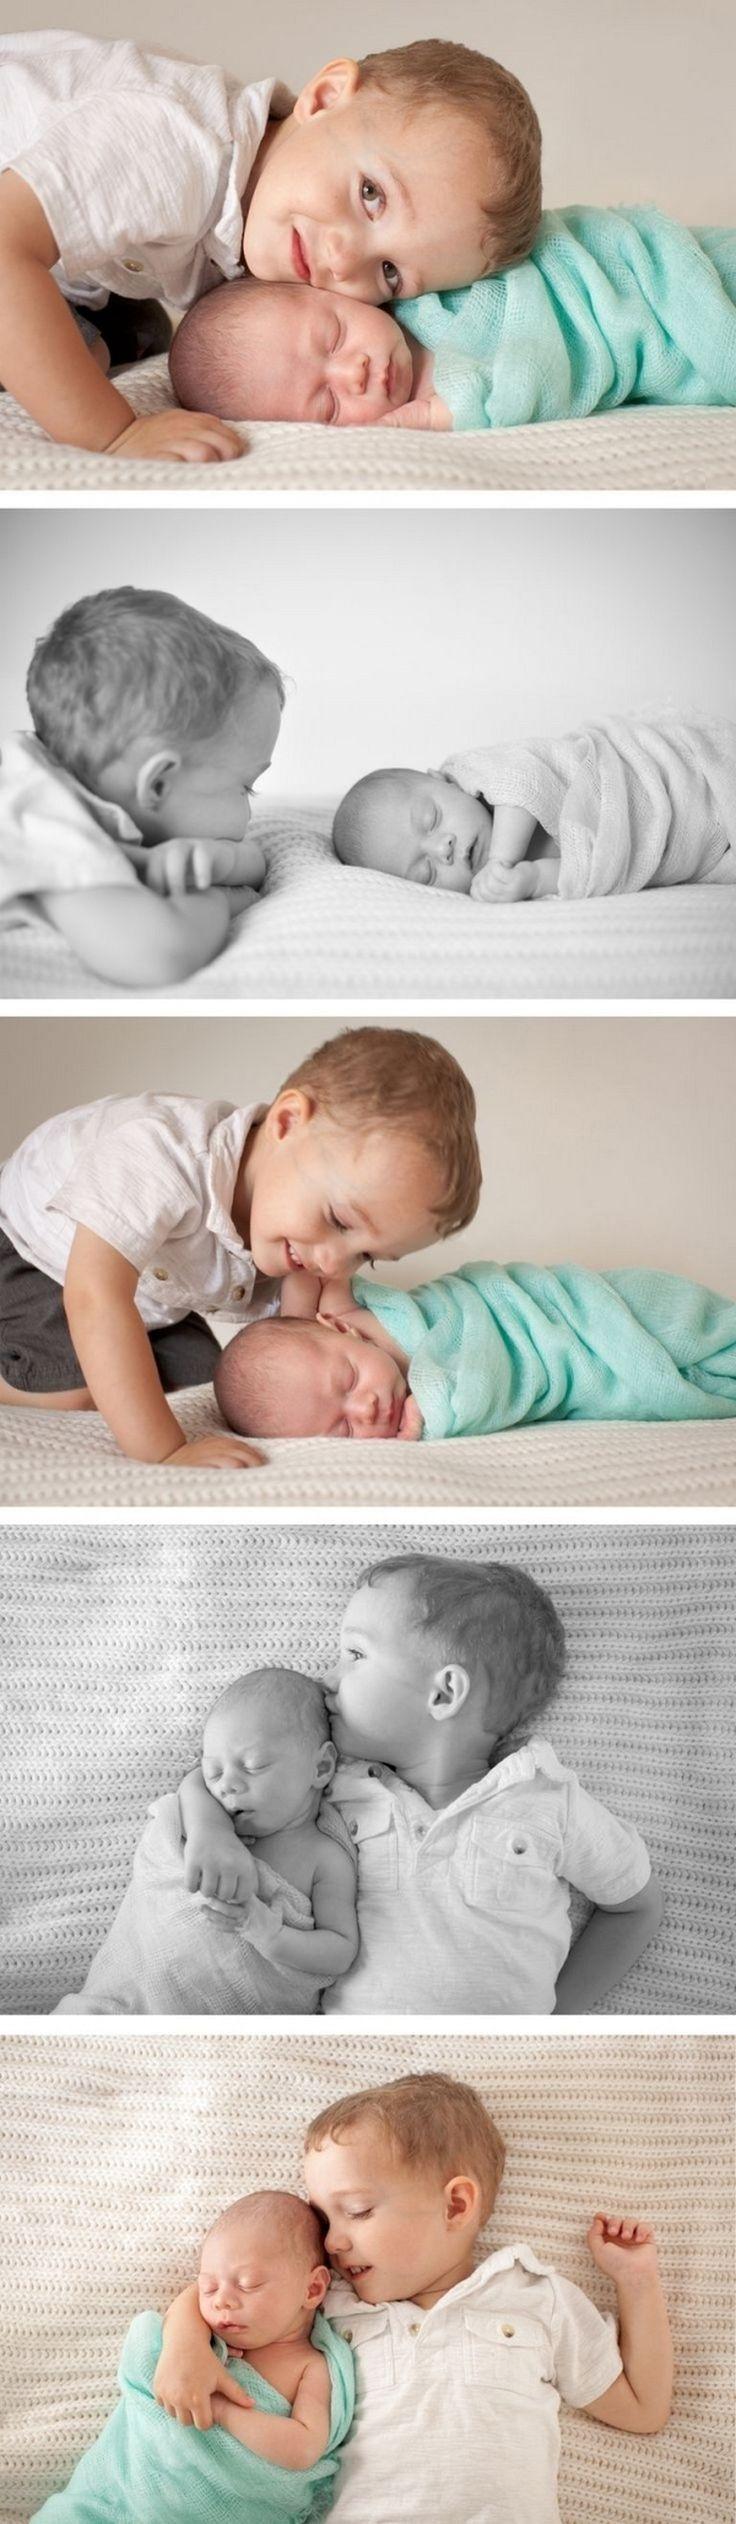 Neugeborene fotografieren Poseideen 48 – Creative Maxx Ideas - Indispensable address of art